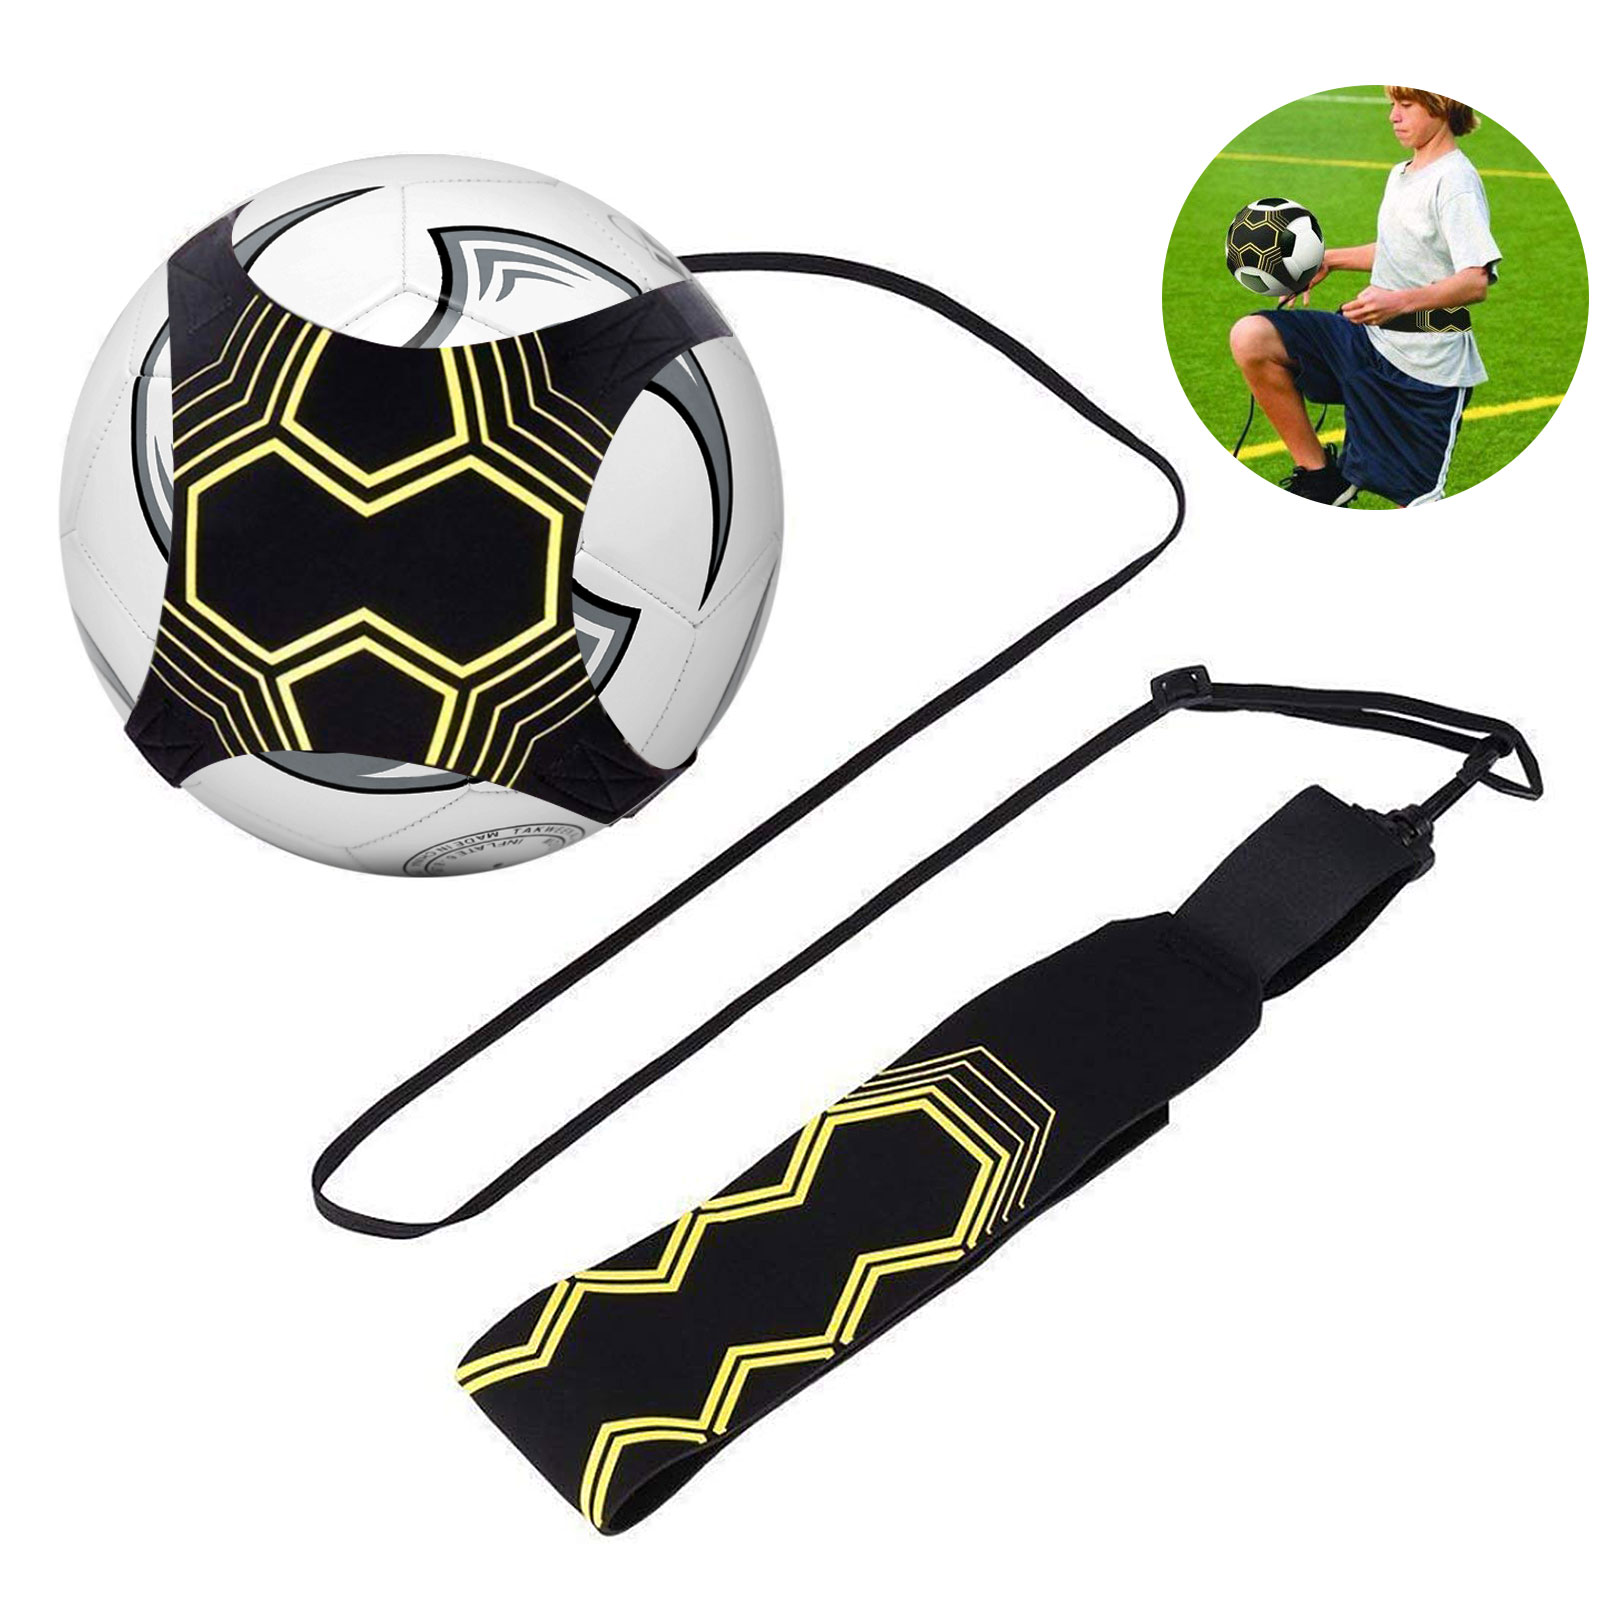 Football Soccer Waist Belt Skill Training Solo Tool Kick Ball Trainer FT